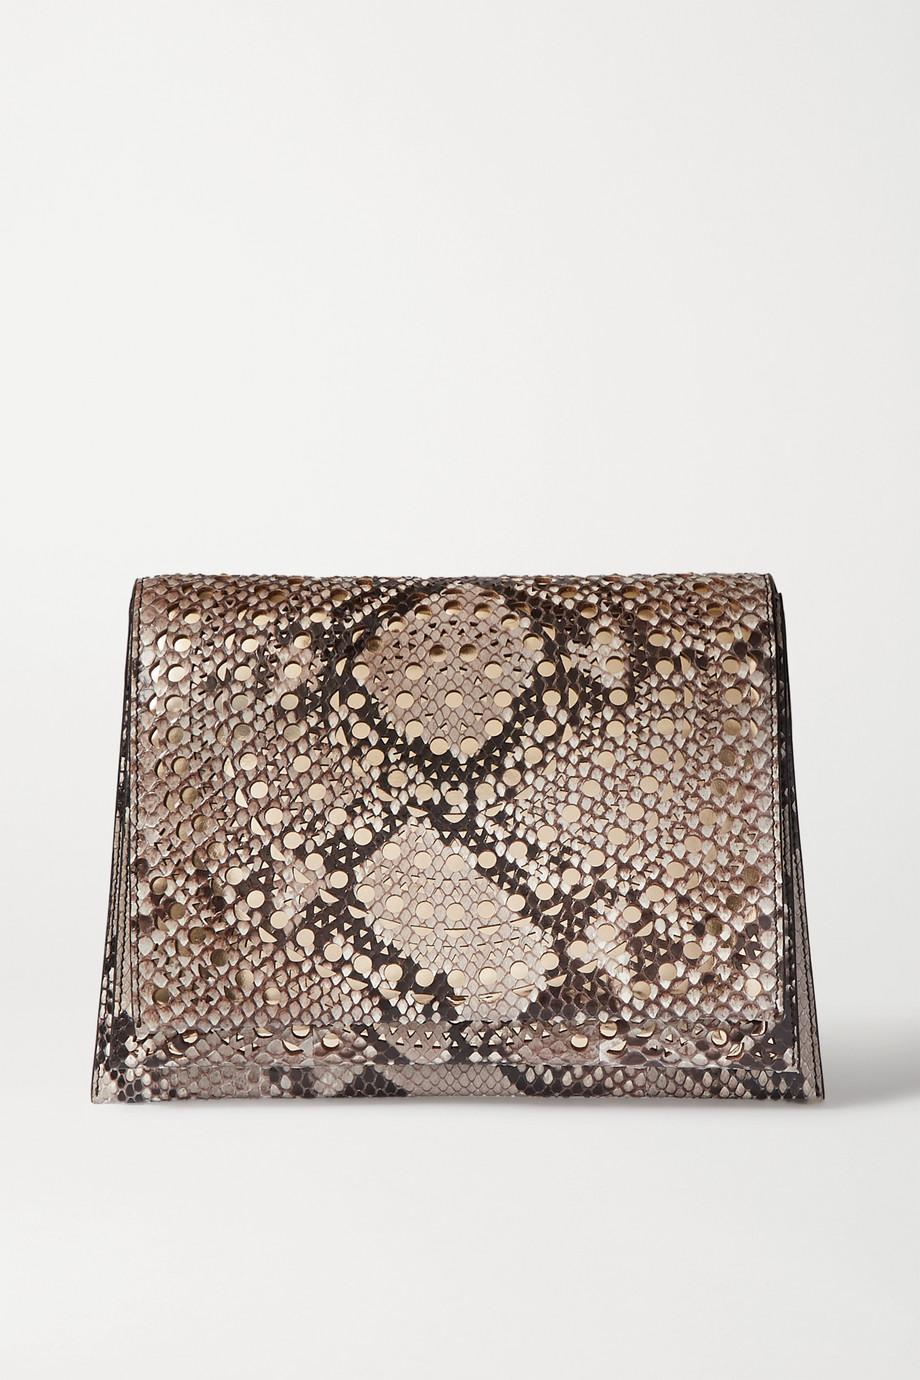 Alaïa Renee laser-cut python clutch